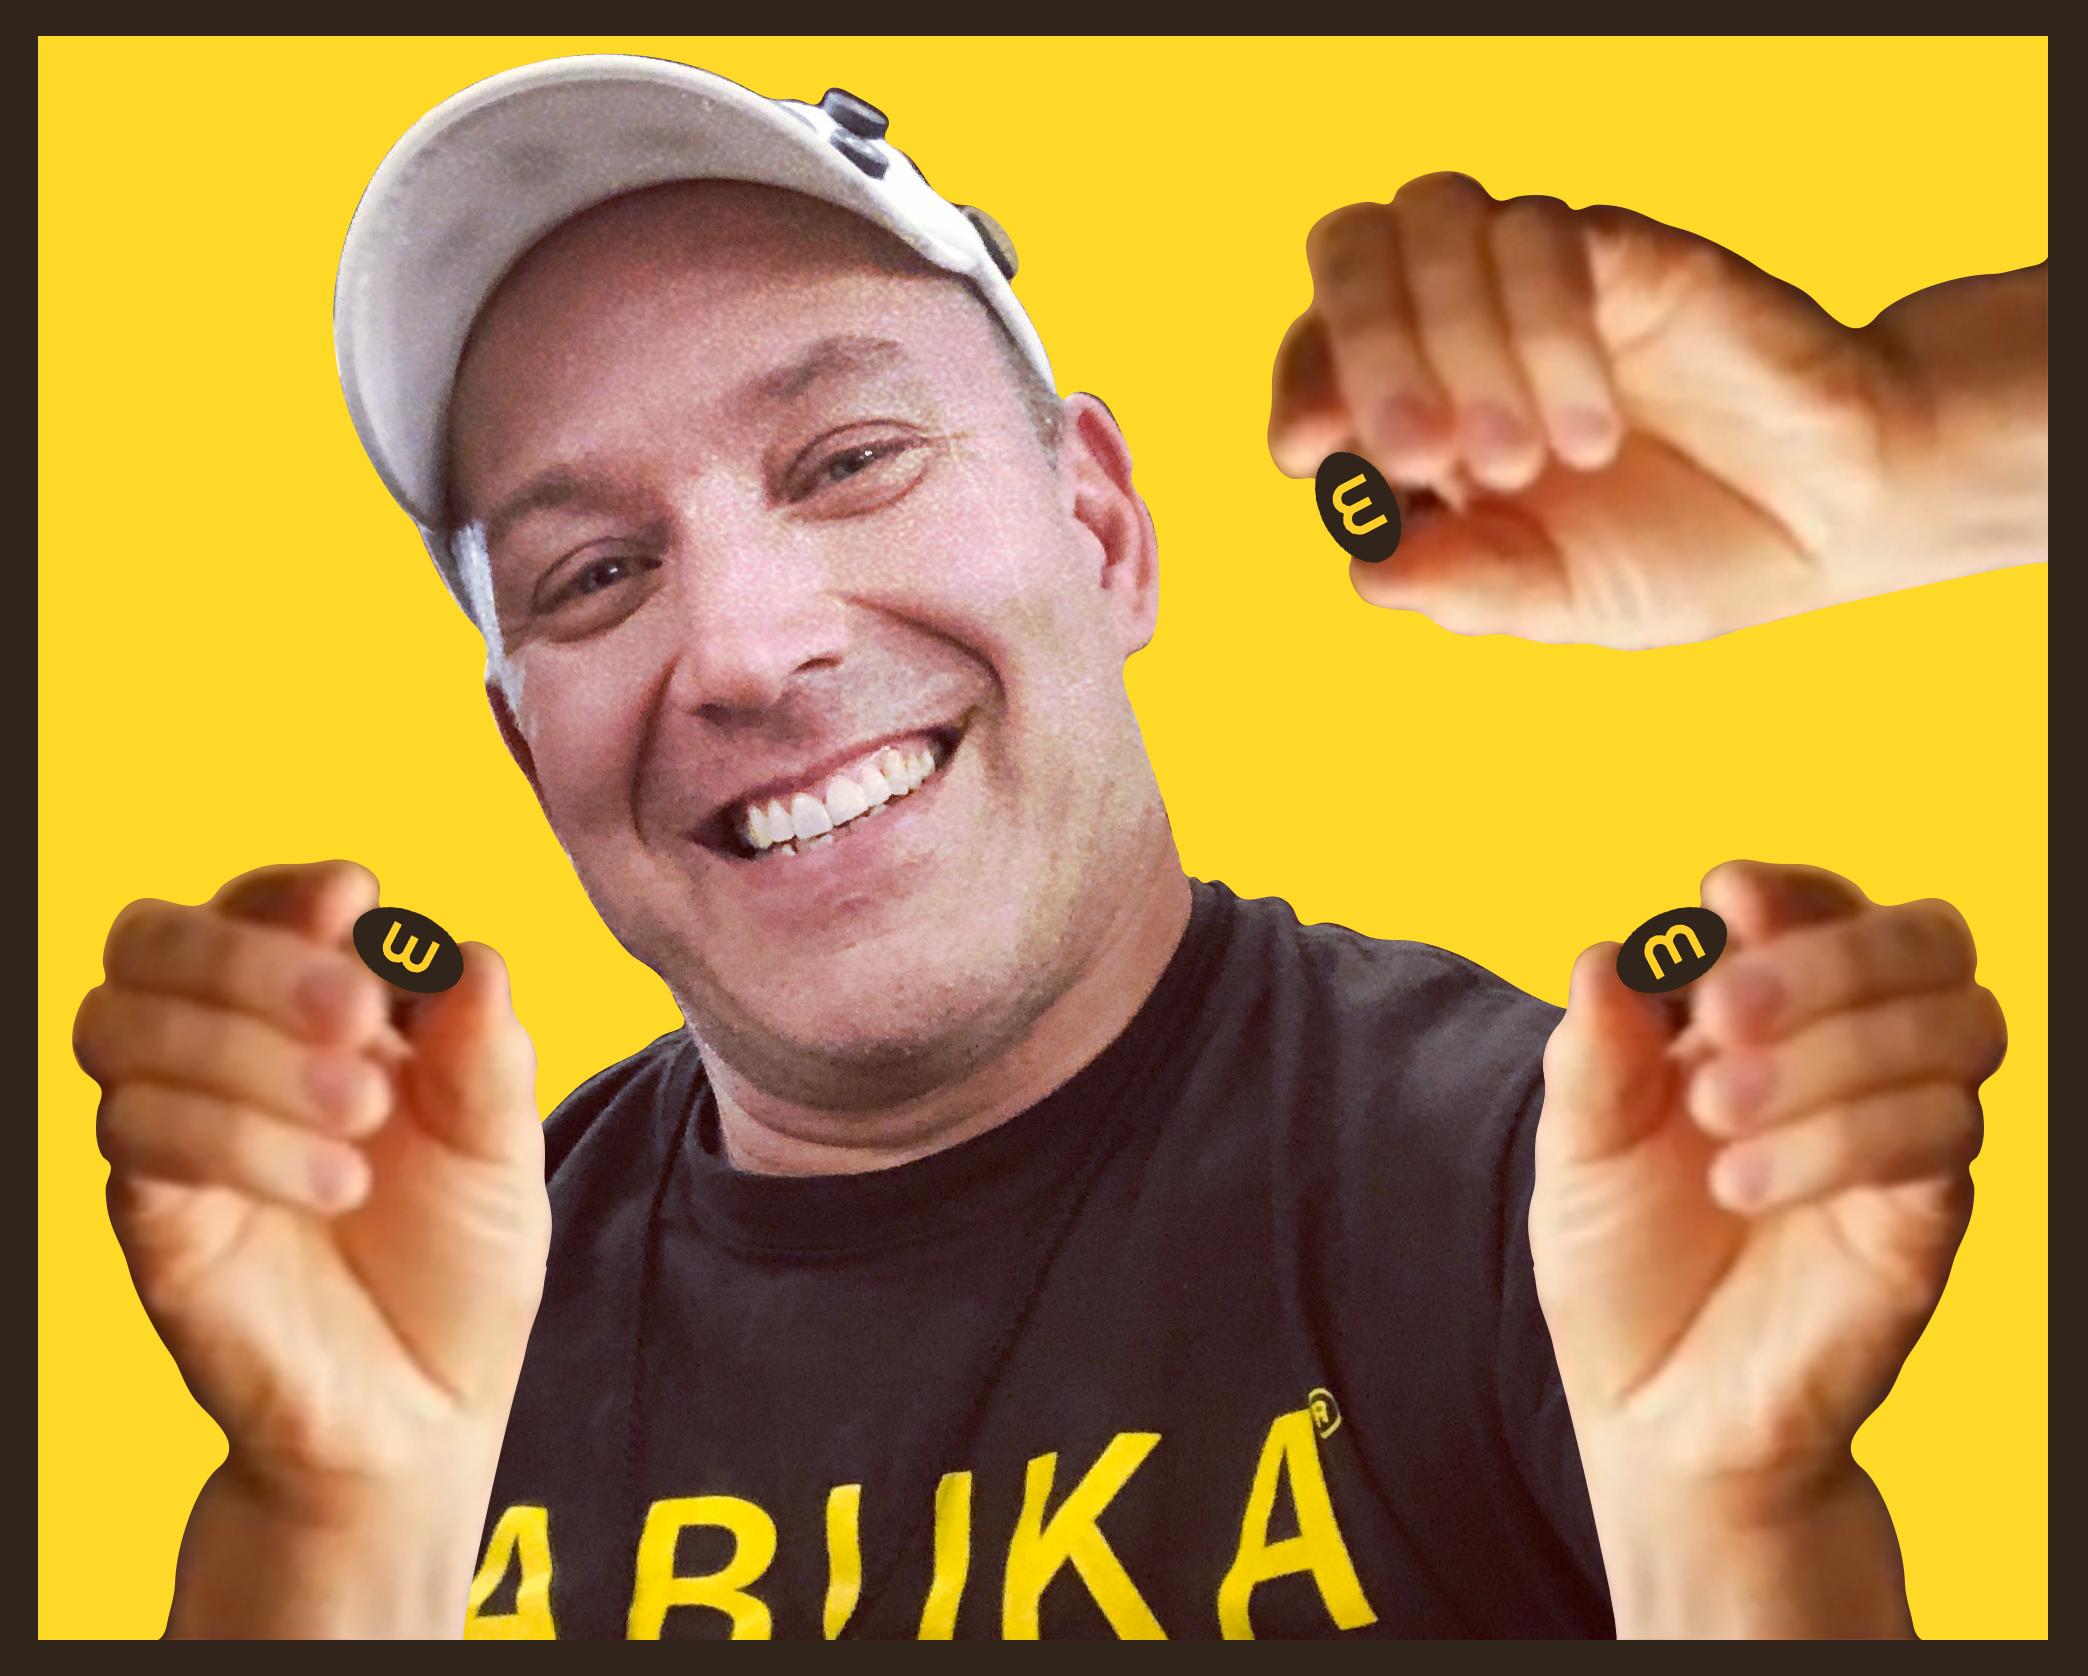 M = W = E          when twisted! - Martin Russocki, Founder & Master Bean Creator, Jabuka Games Inc.